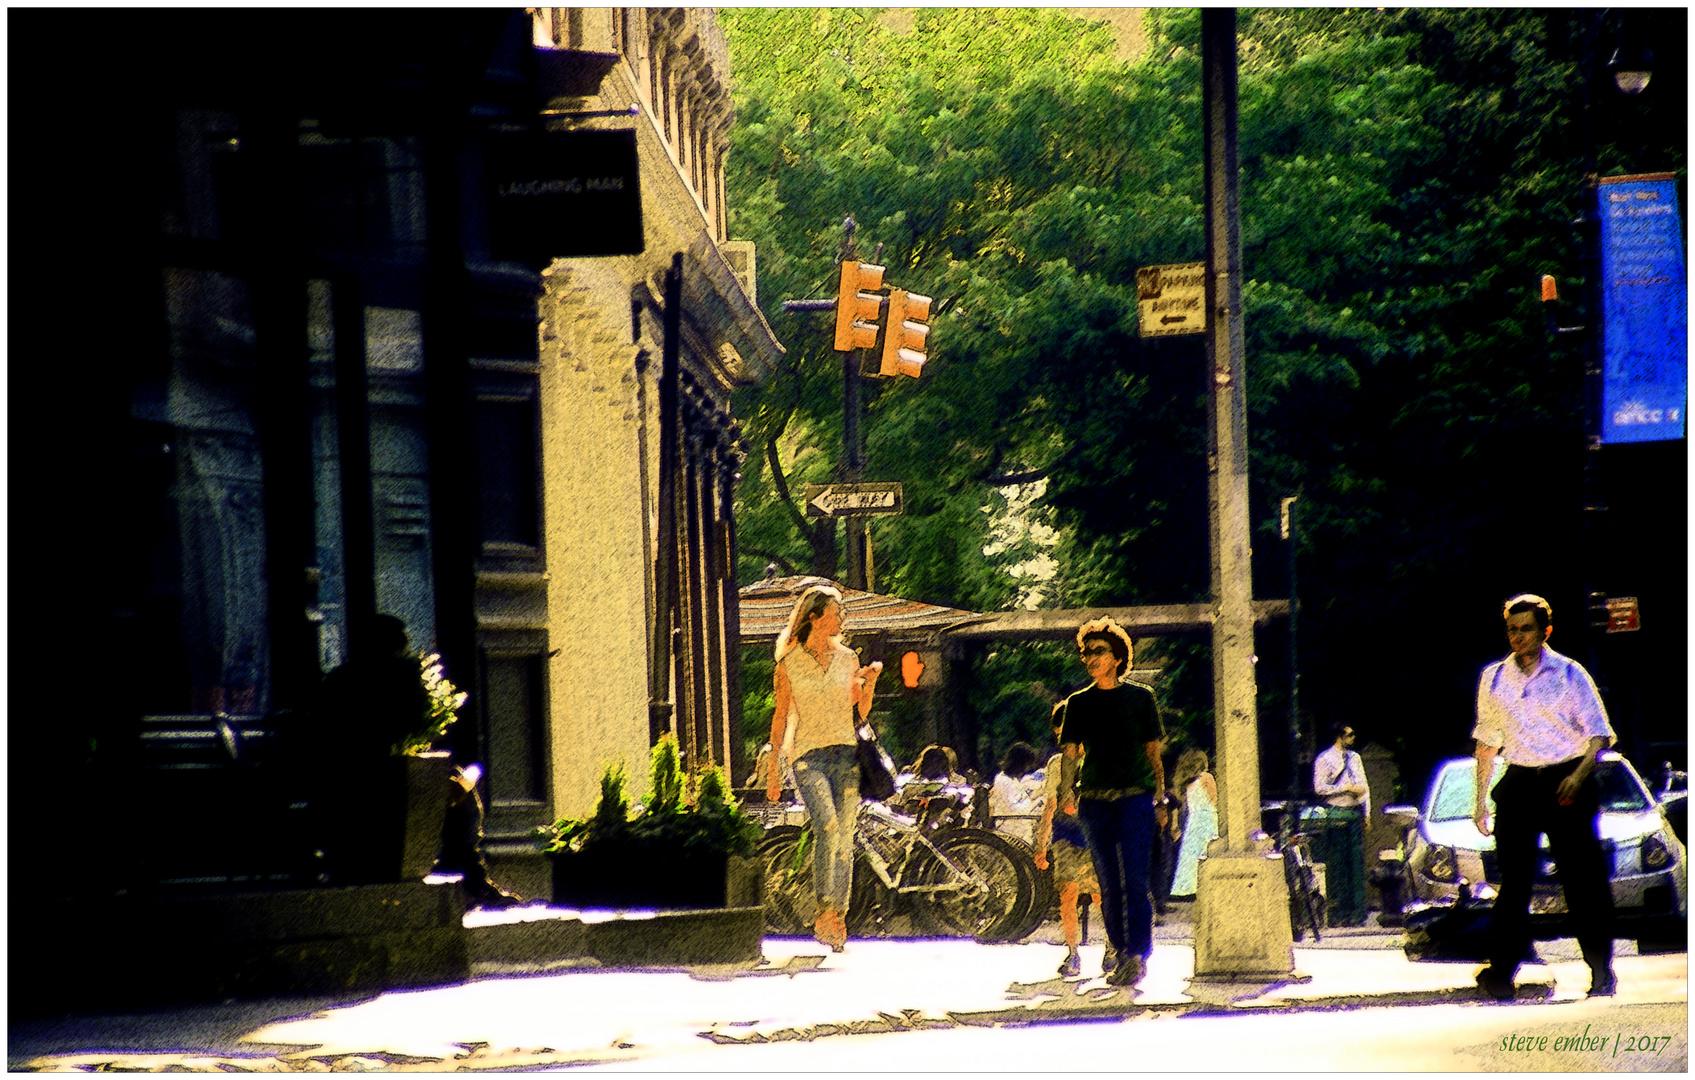 Duane Street Summer - a Tribeca Impression